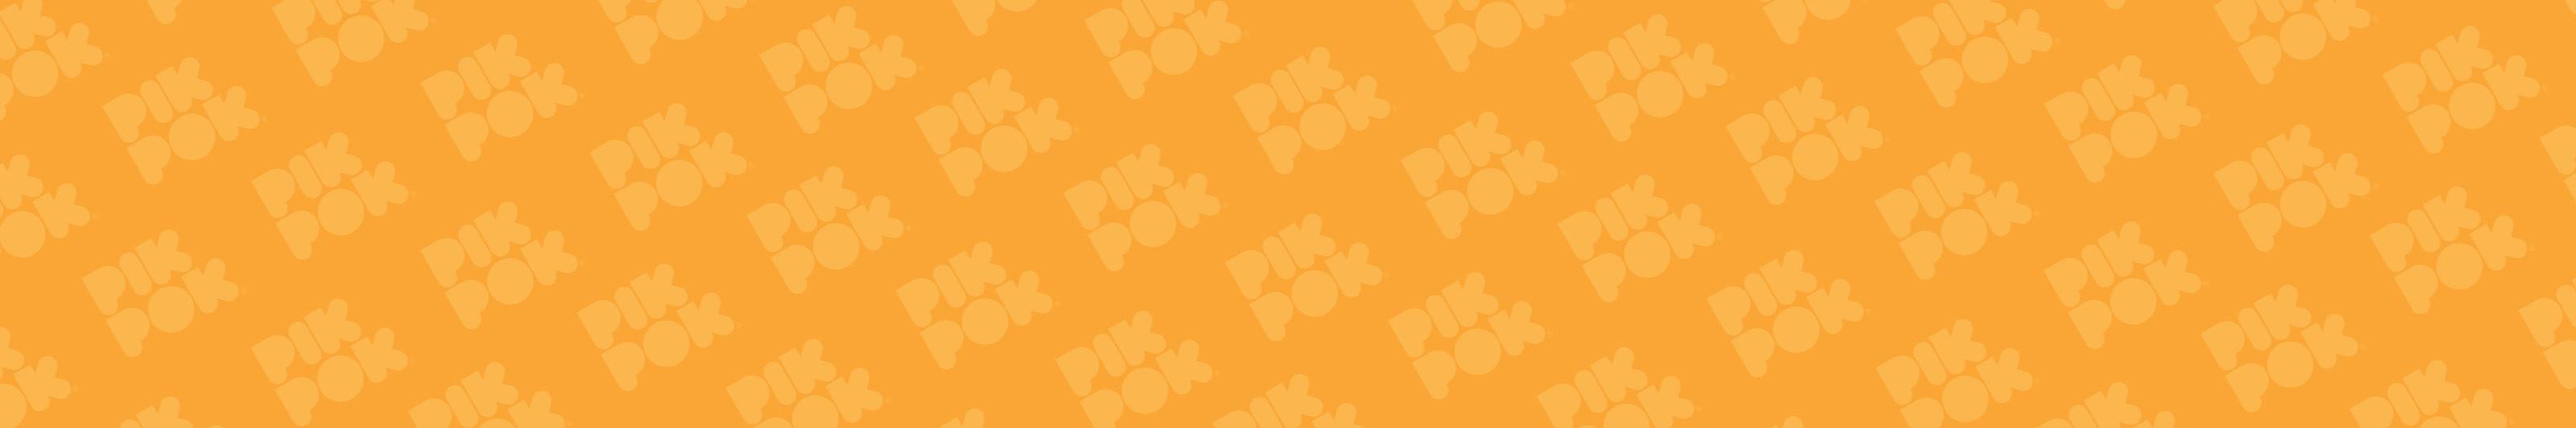 PikPok news banner orange